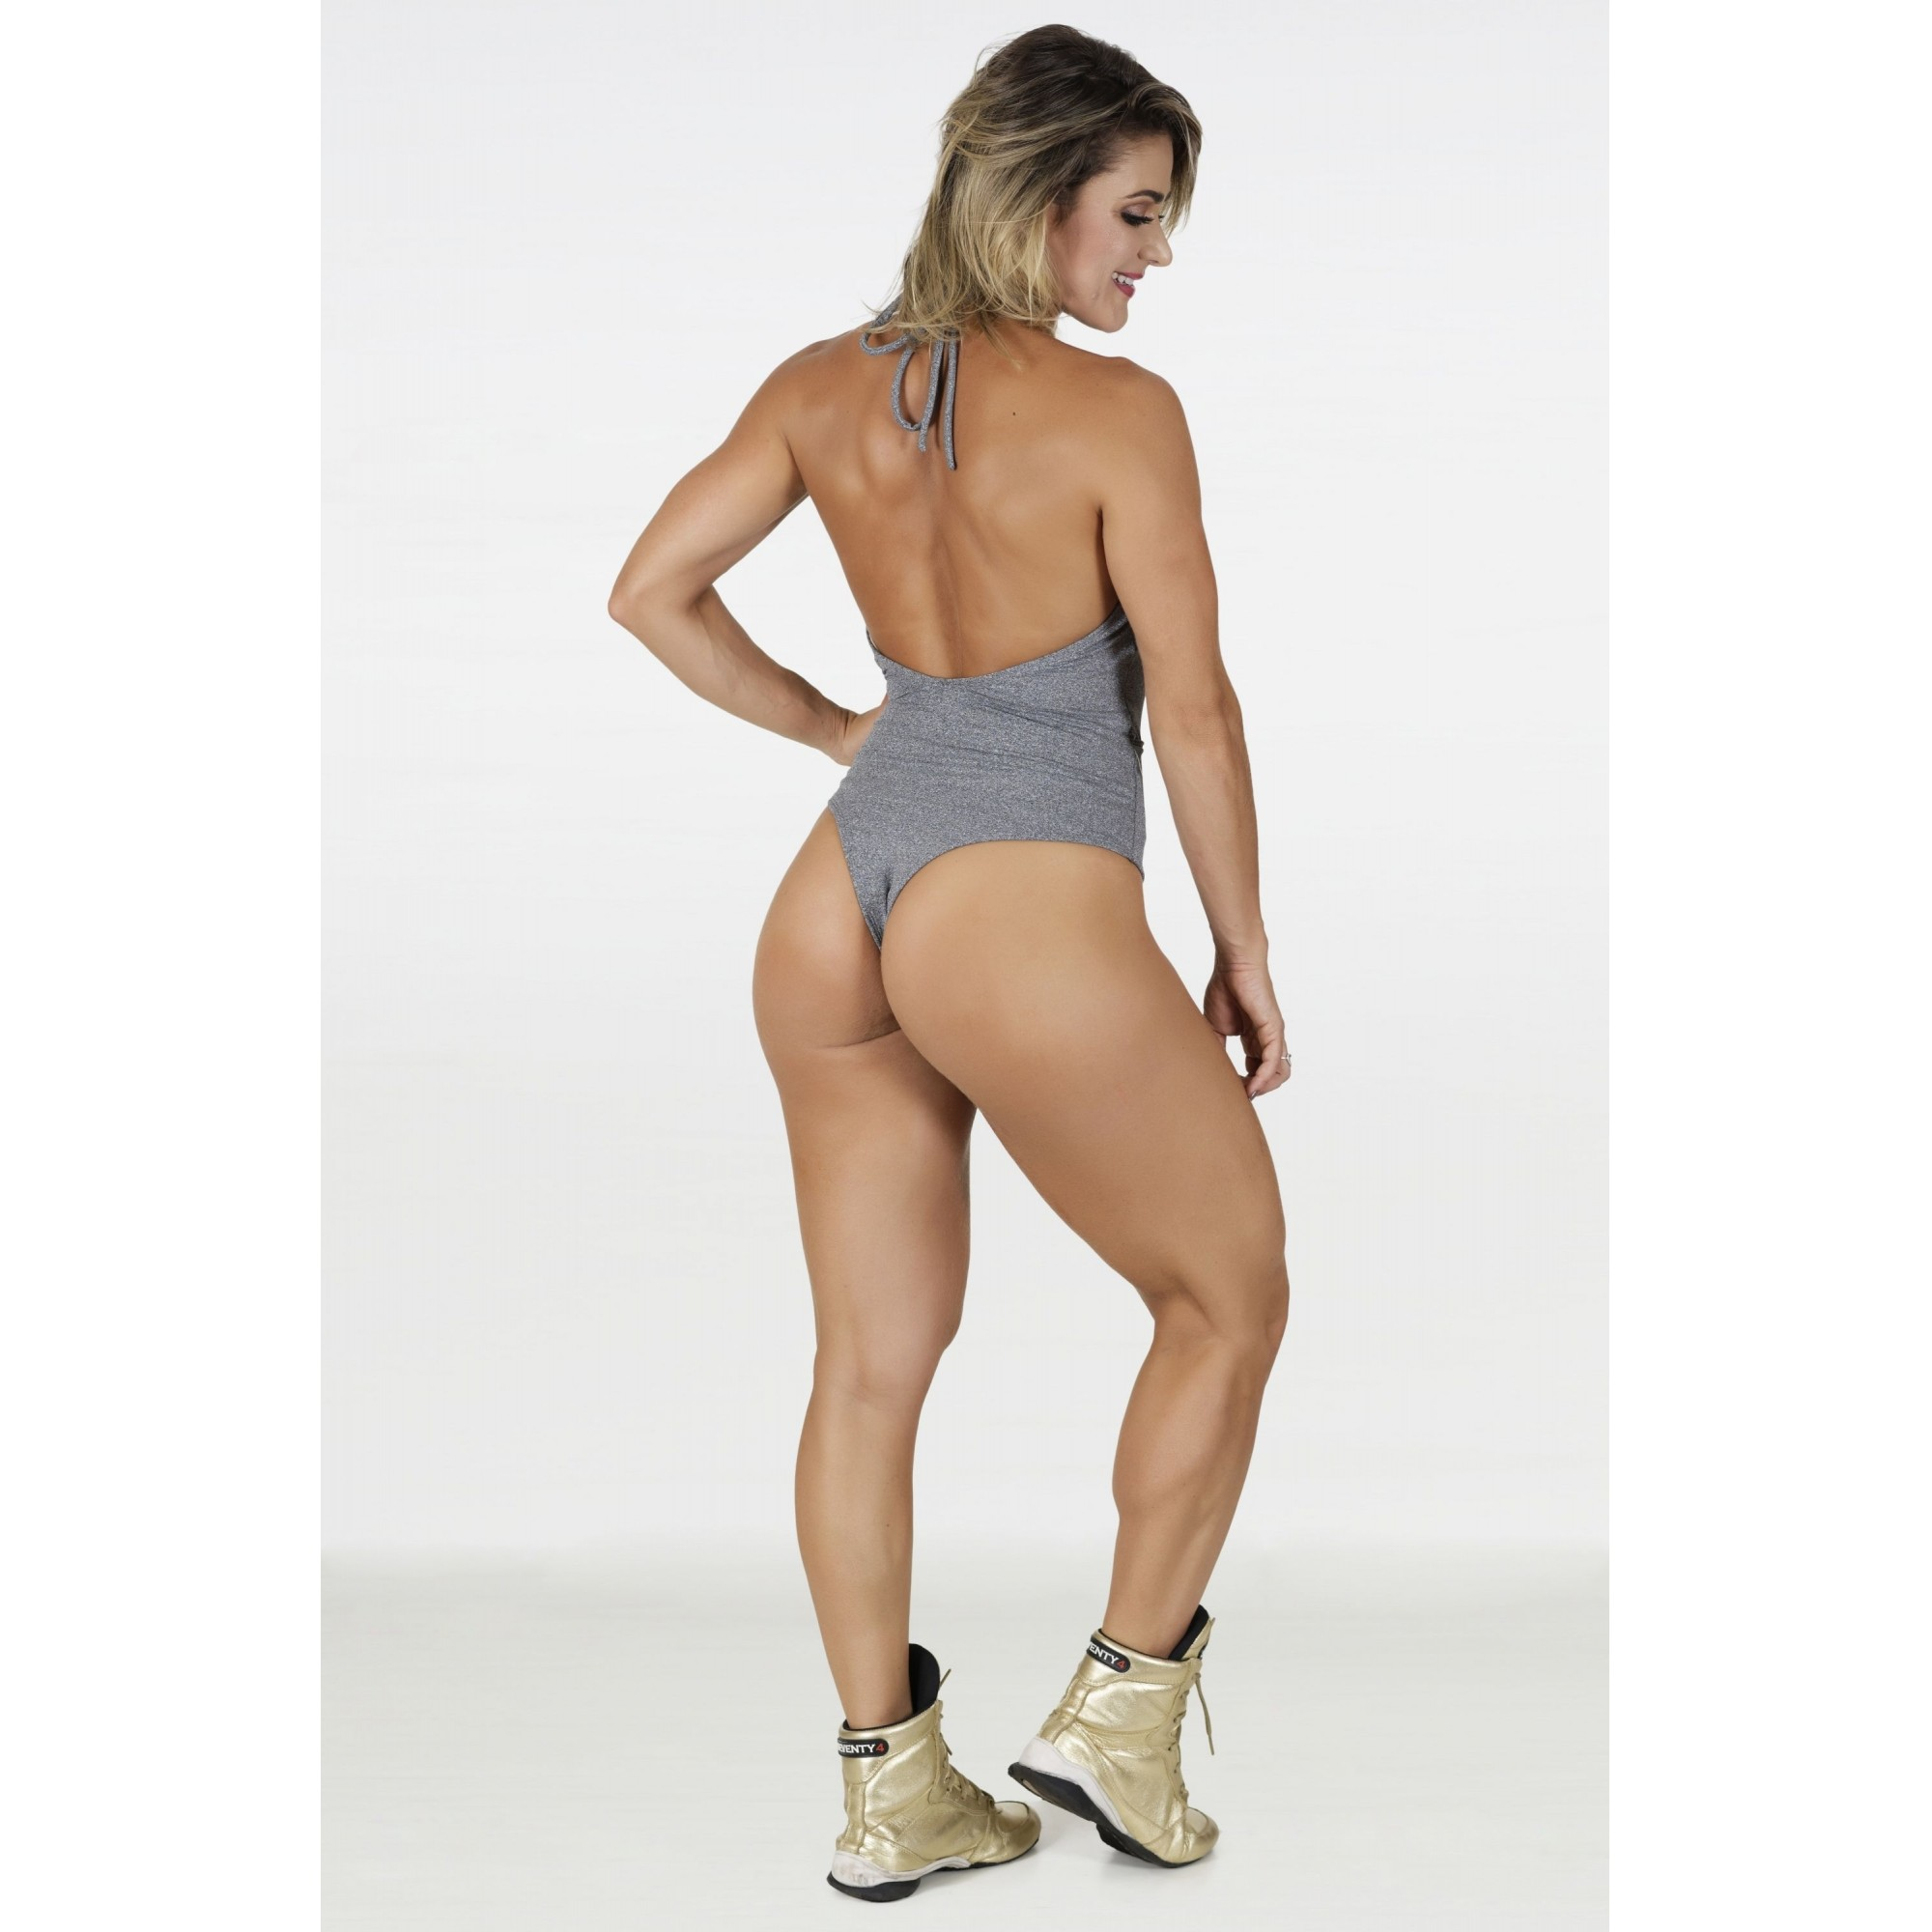 Body Maiô May Cinza Mescla  - Fribasex - Fabricasex.com